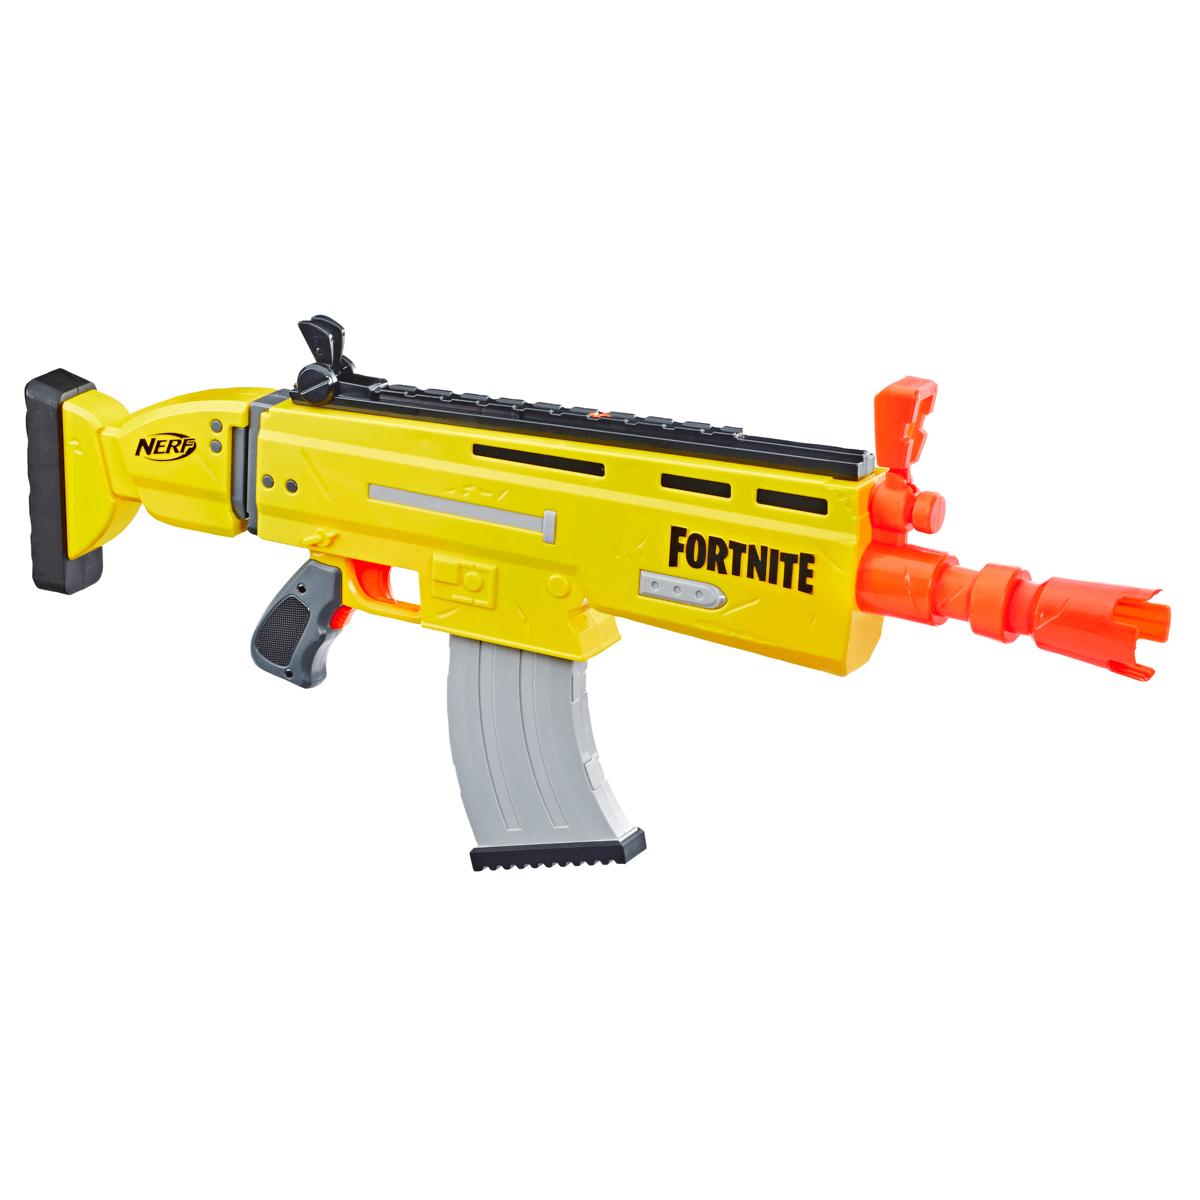 Nerf fortnite AR-L gun £25 @ Tesco (Alloa)